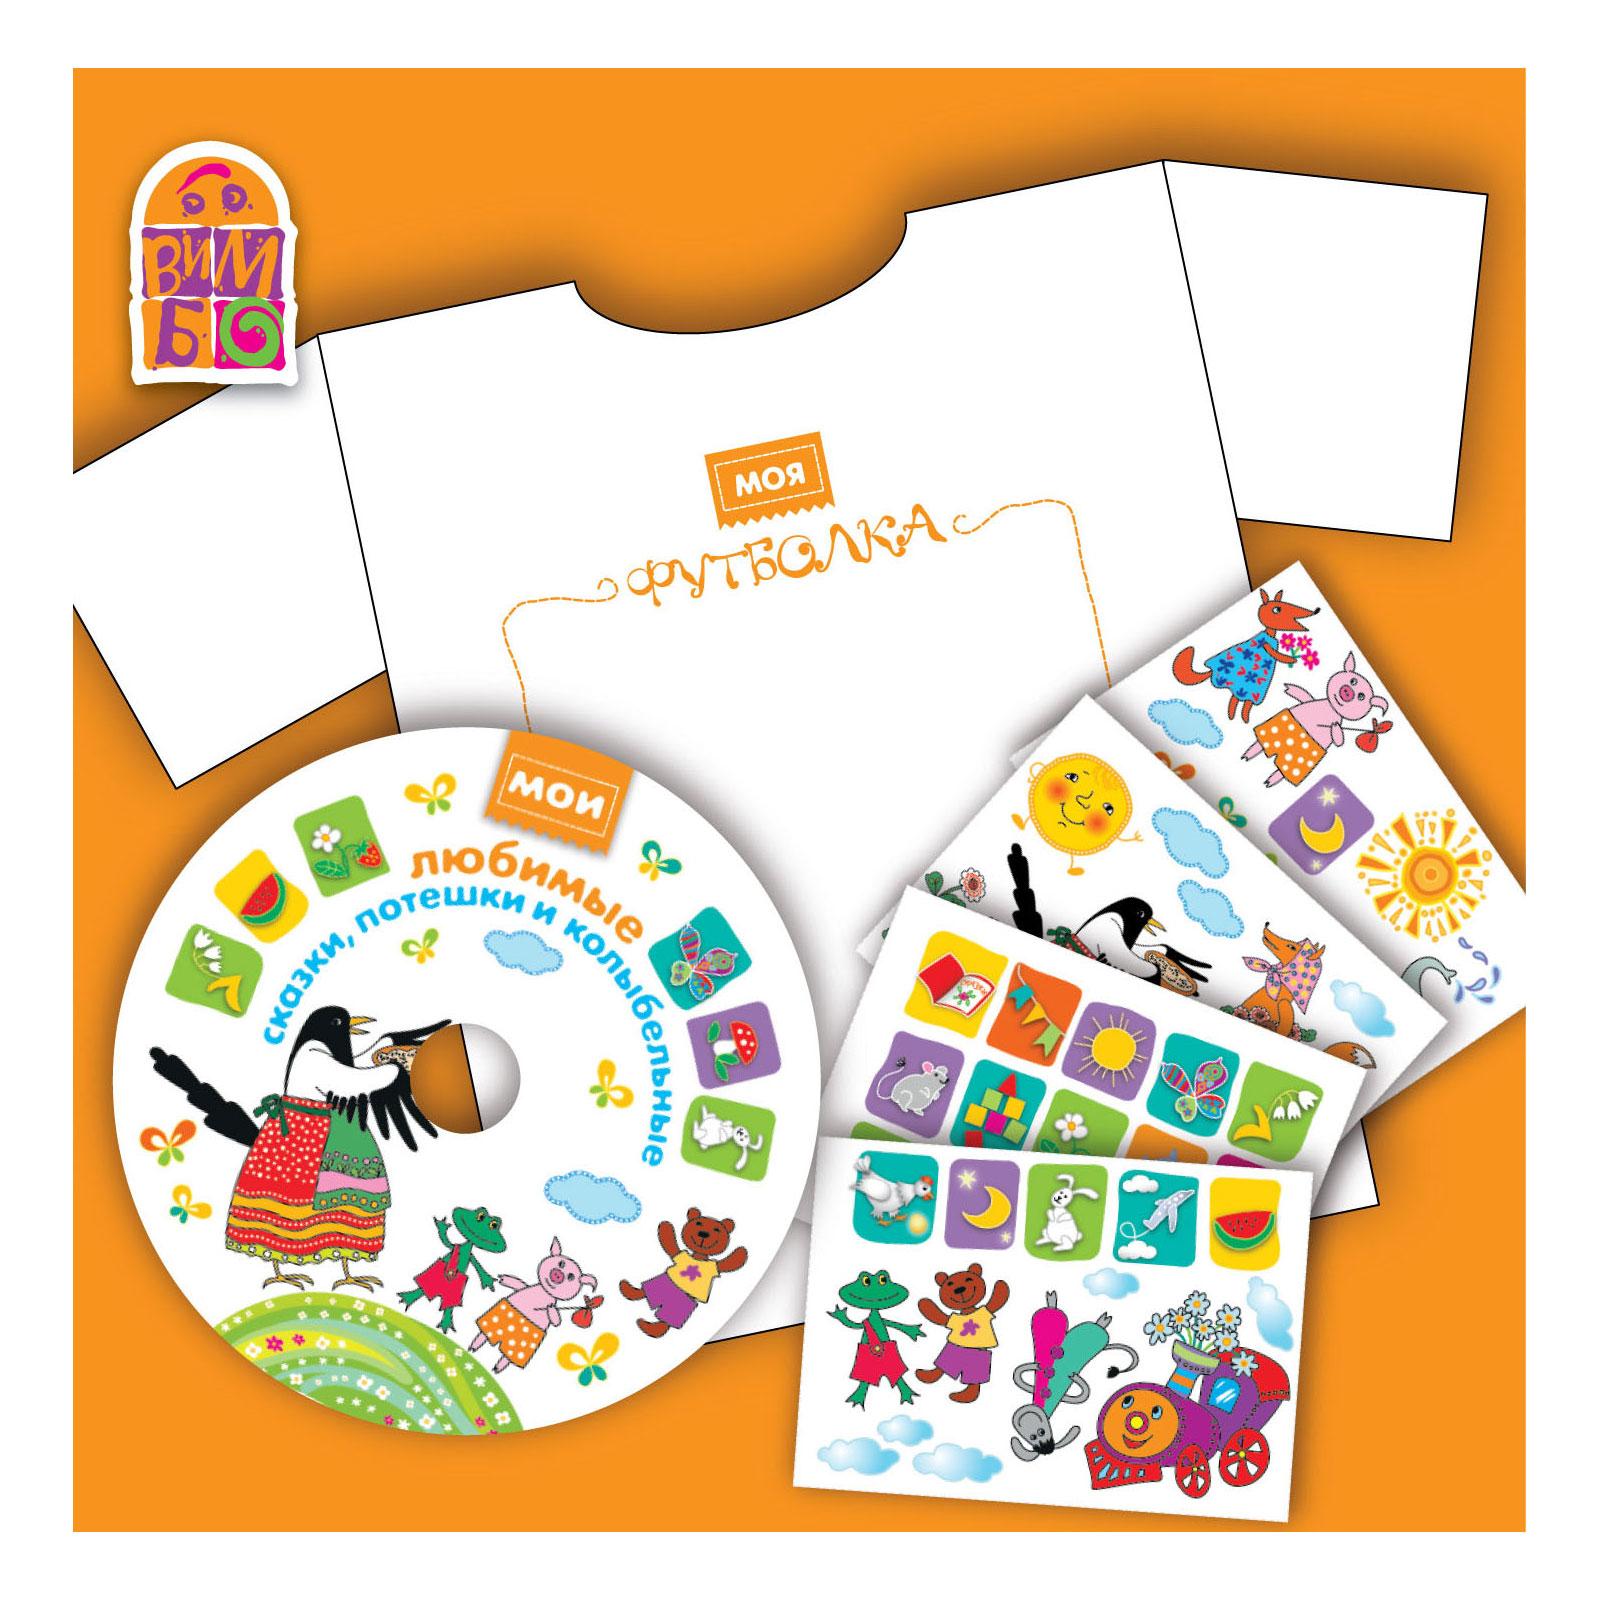 Развивающий набор для совместного творчества Вимбо Моя футболка + диск (Рост 92/98)<br>